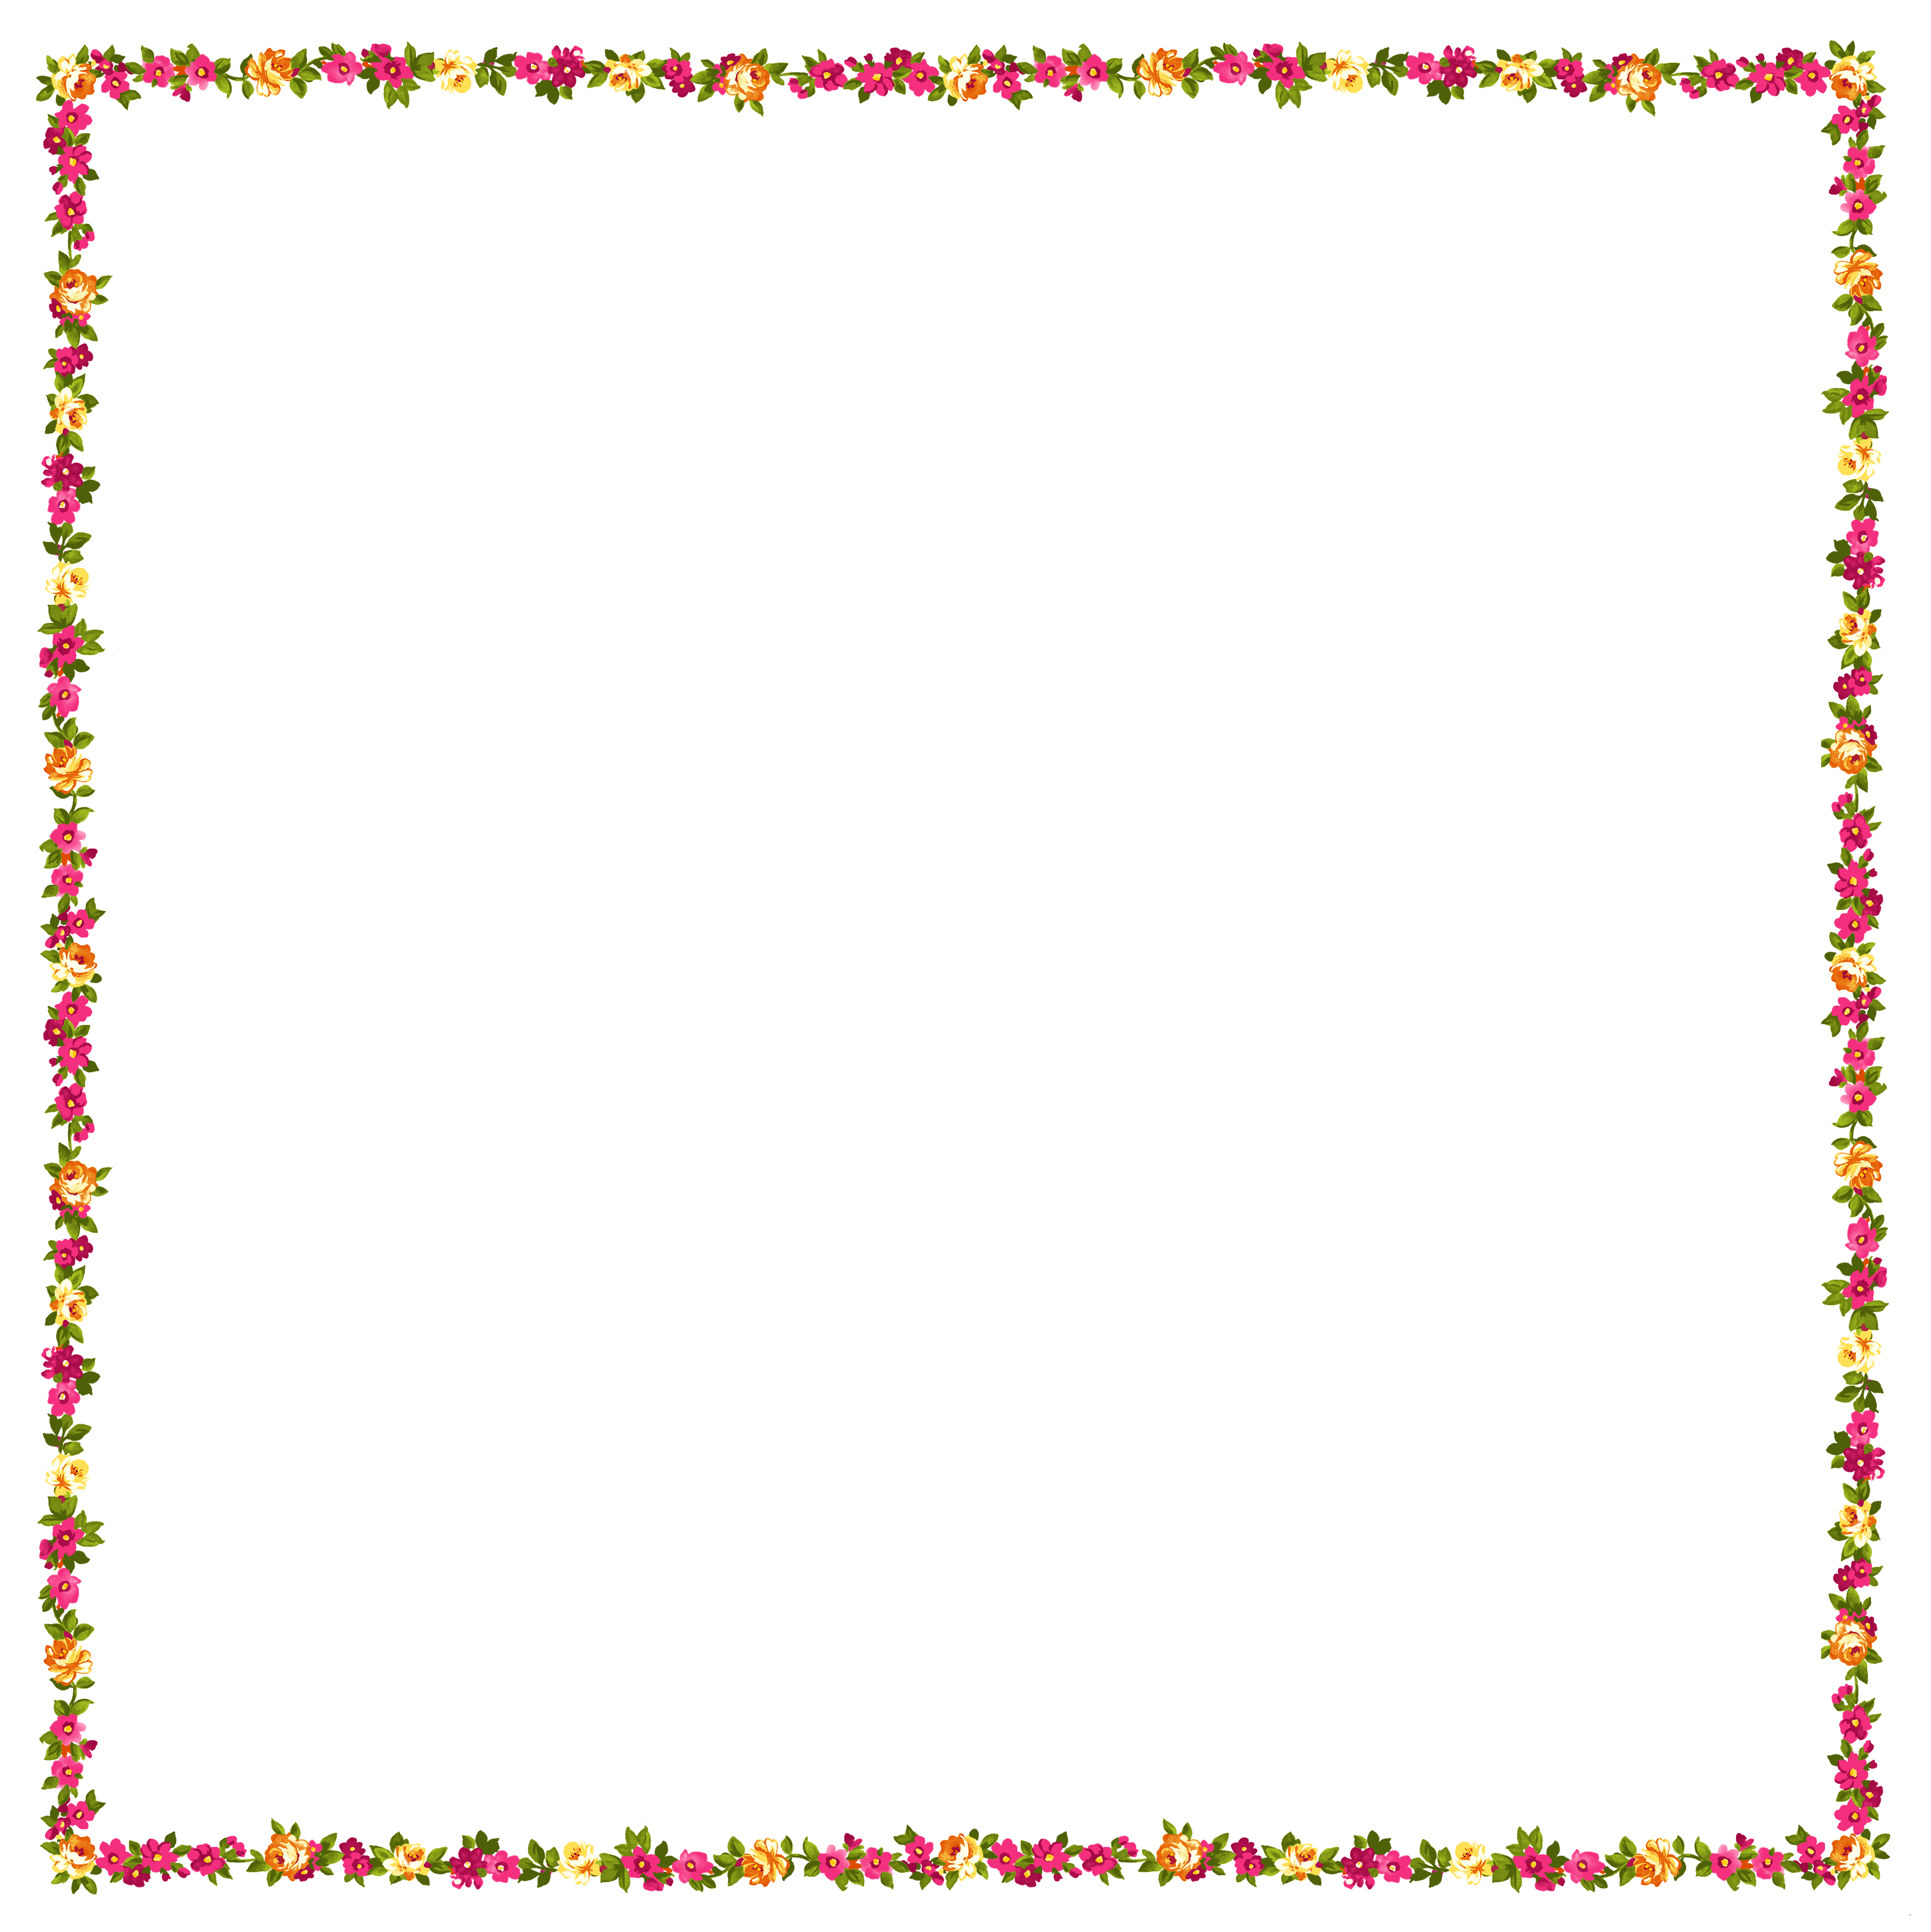 Transparent Floral Frame Decor PNG Clipart.